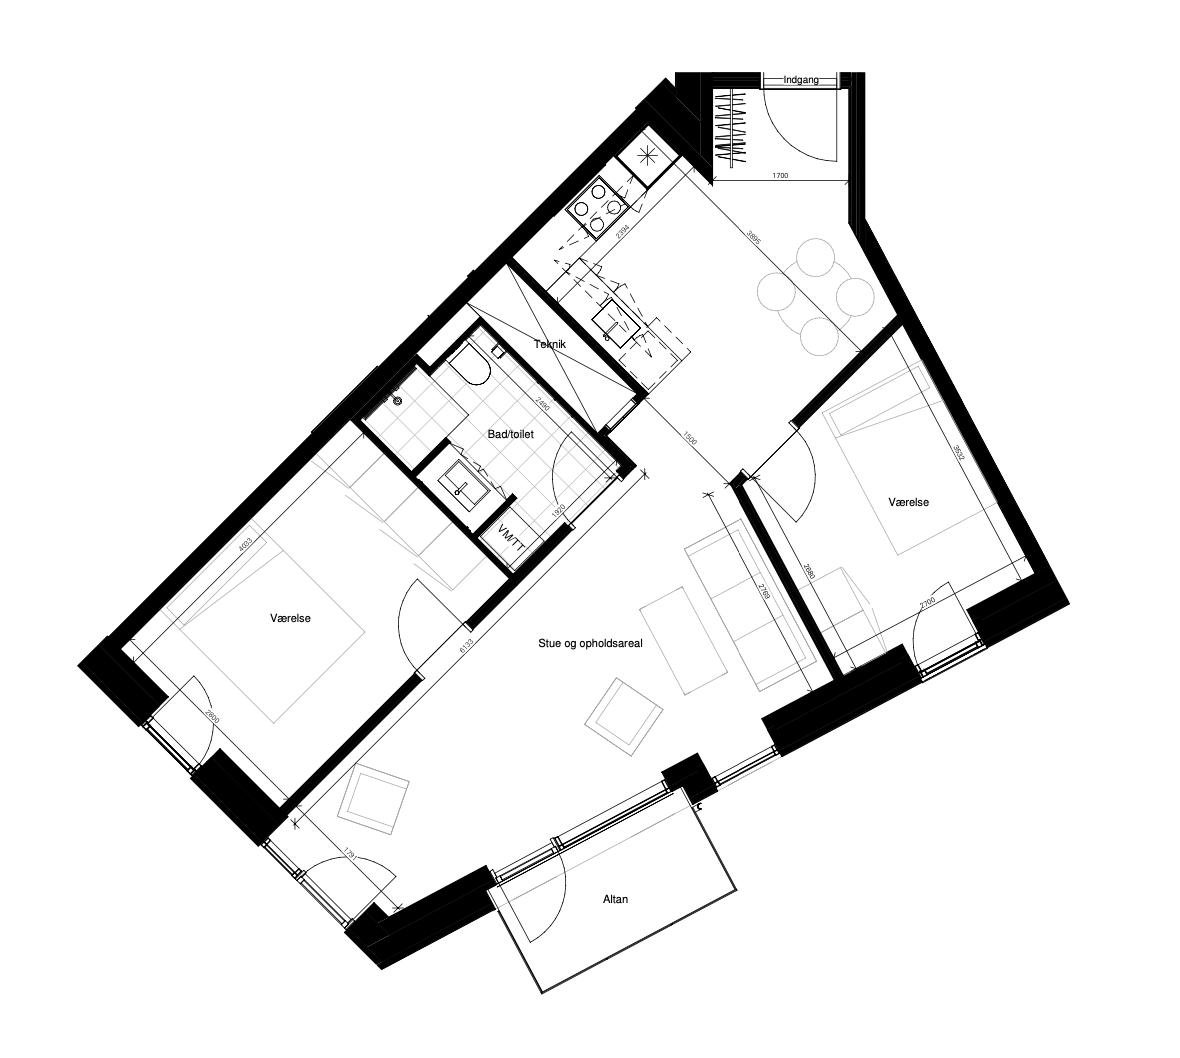 Plantegning - Borggade 6E, 1.th, 8000 Aarhus C